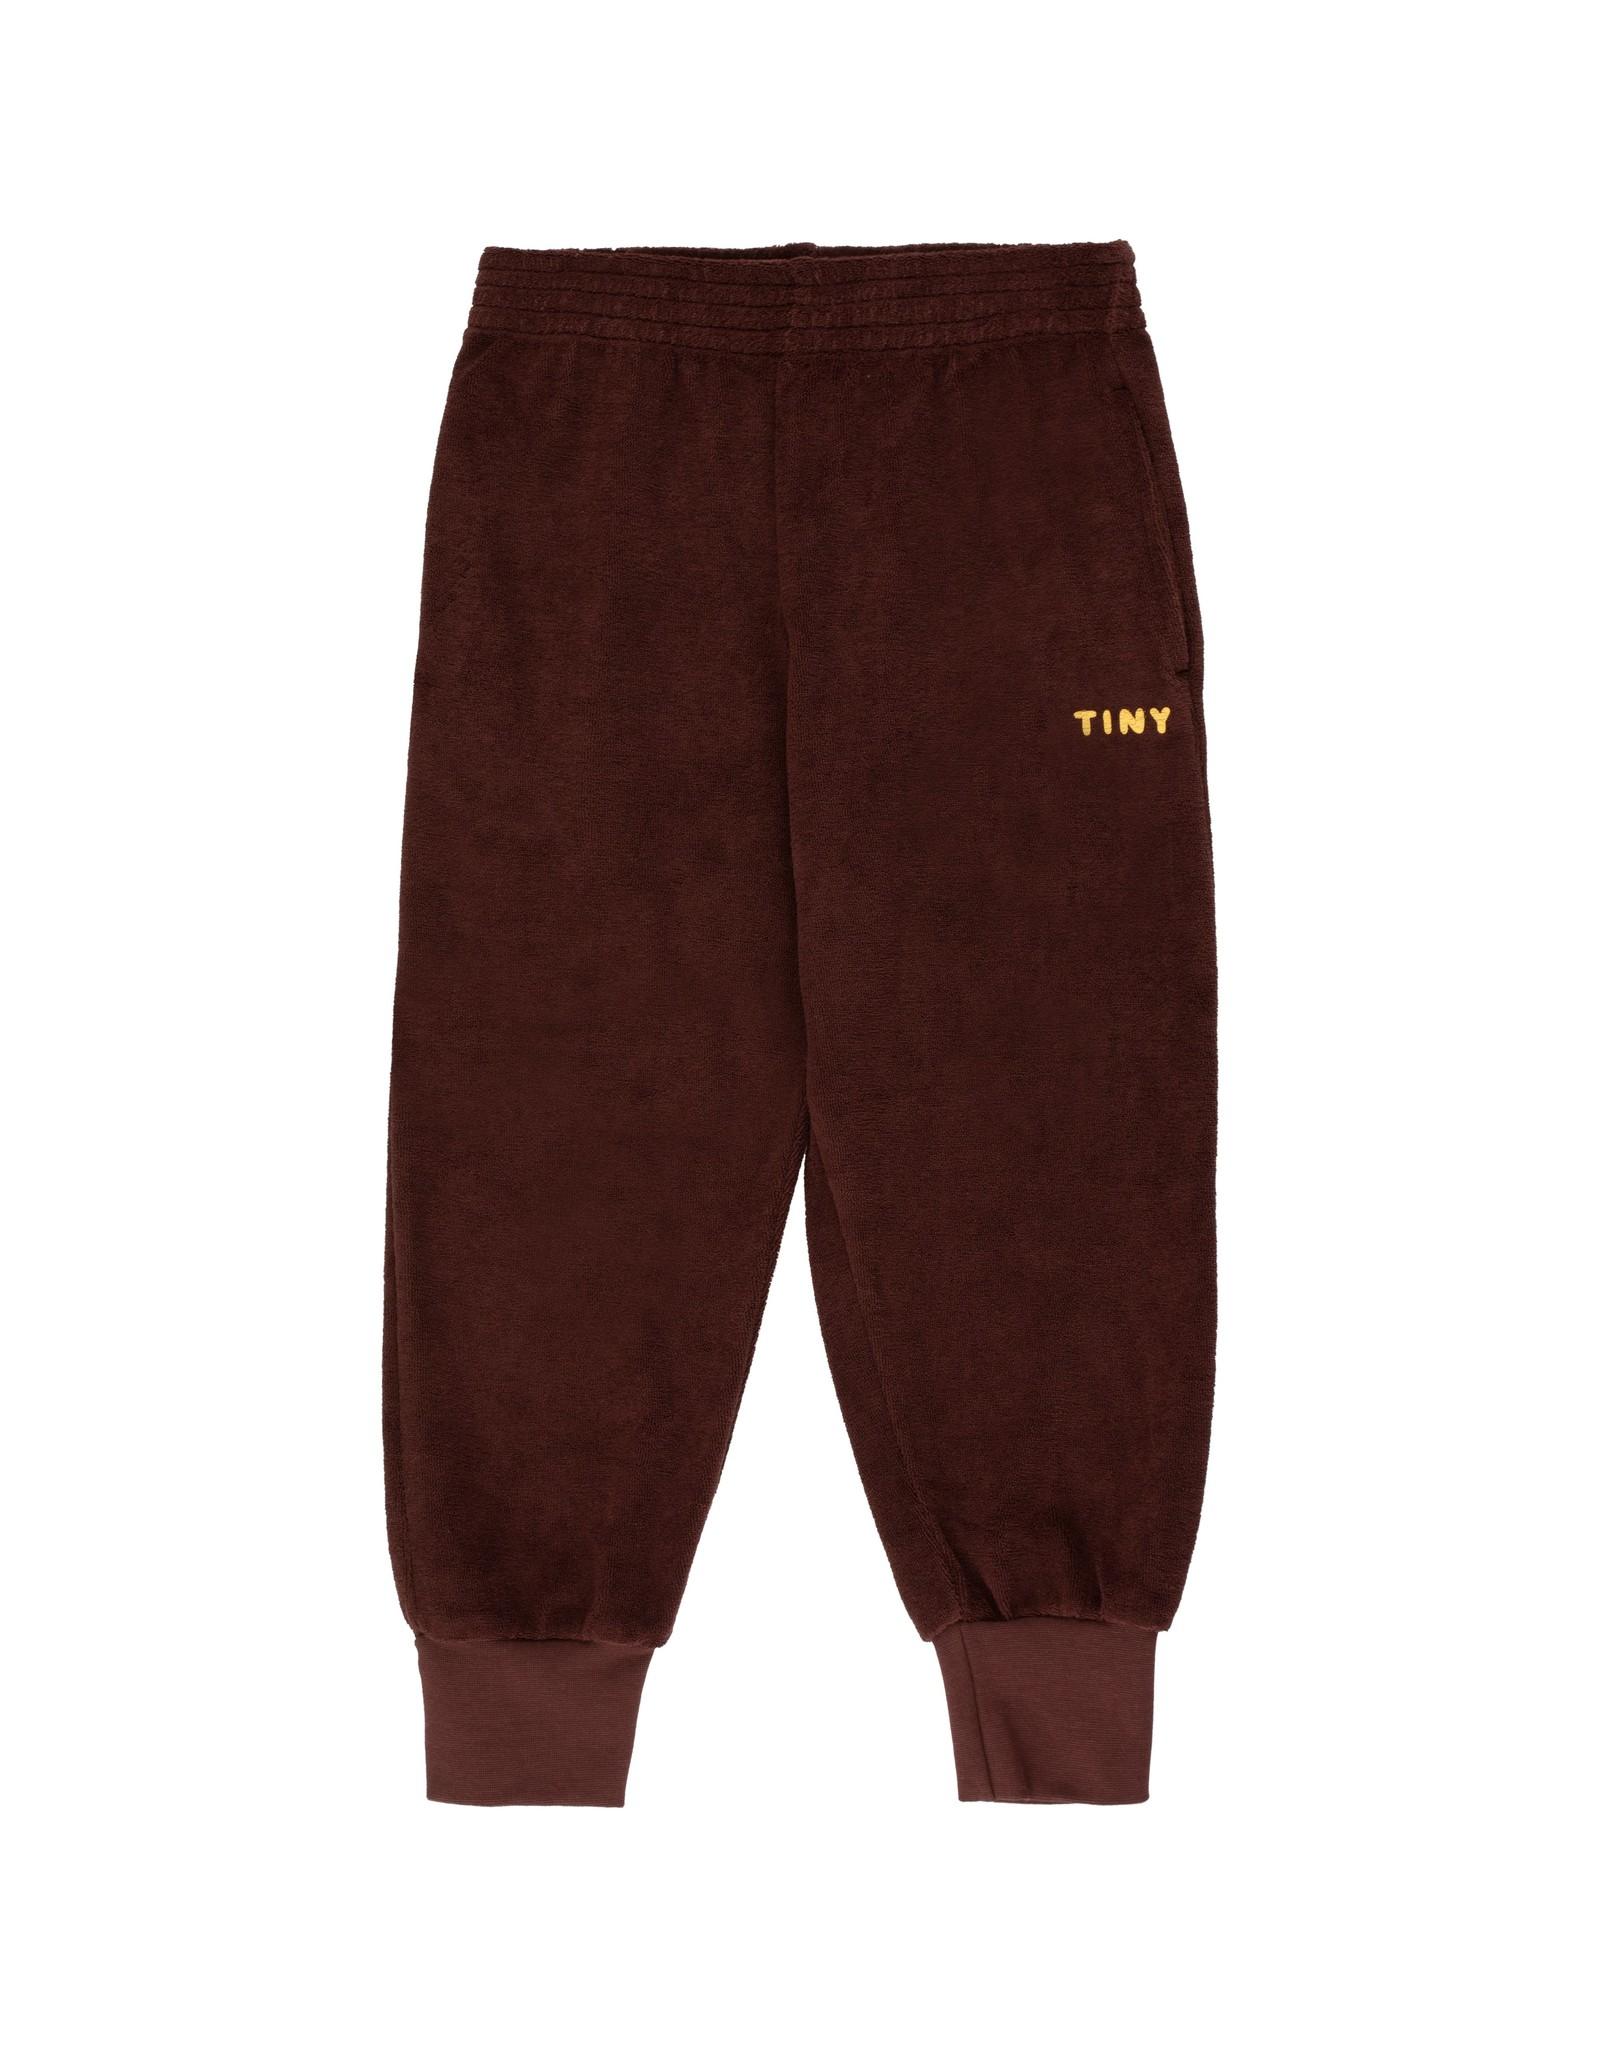 "Tinycottons Pantalon ""TINY"""